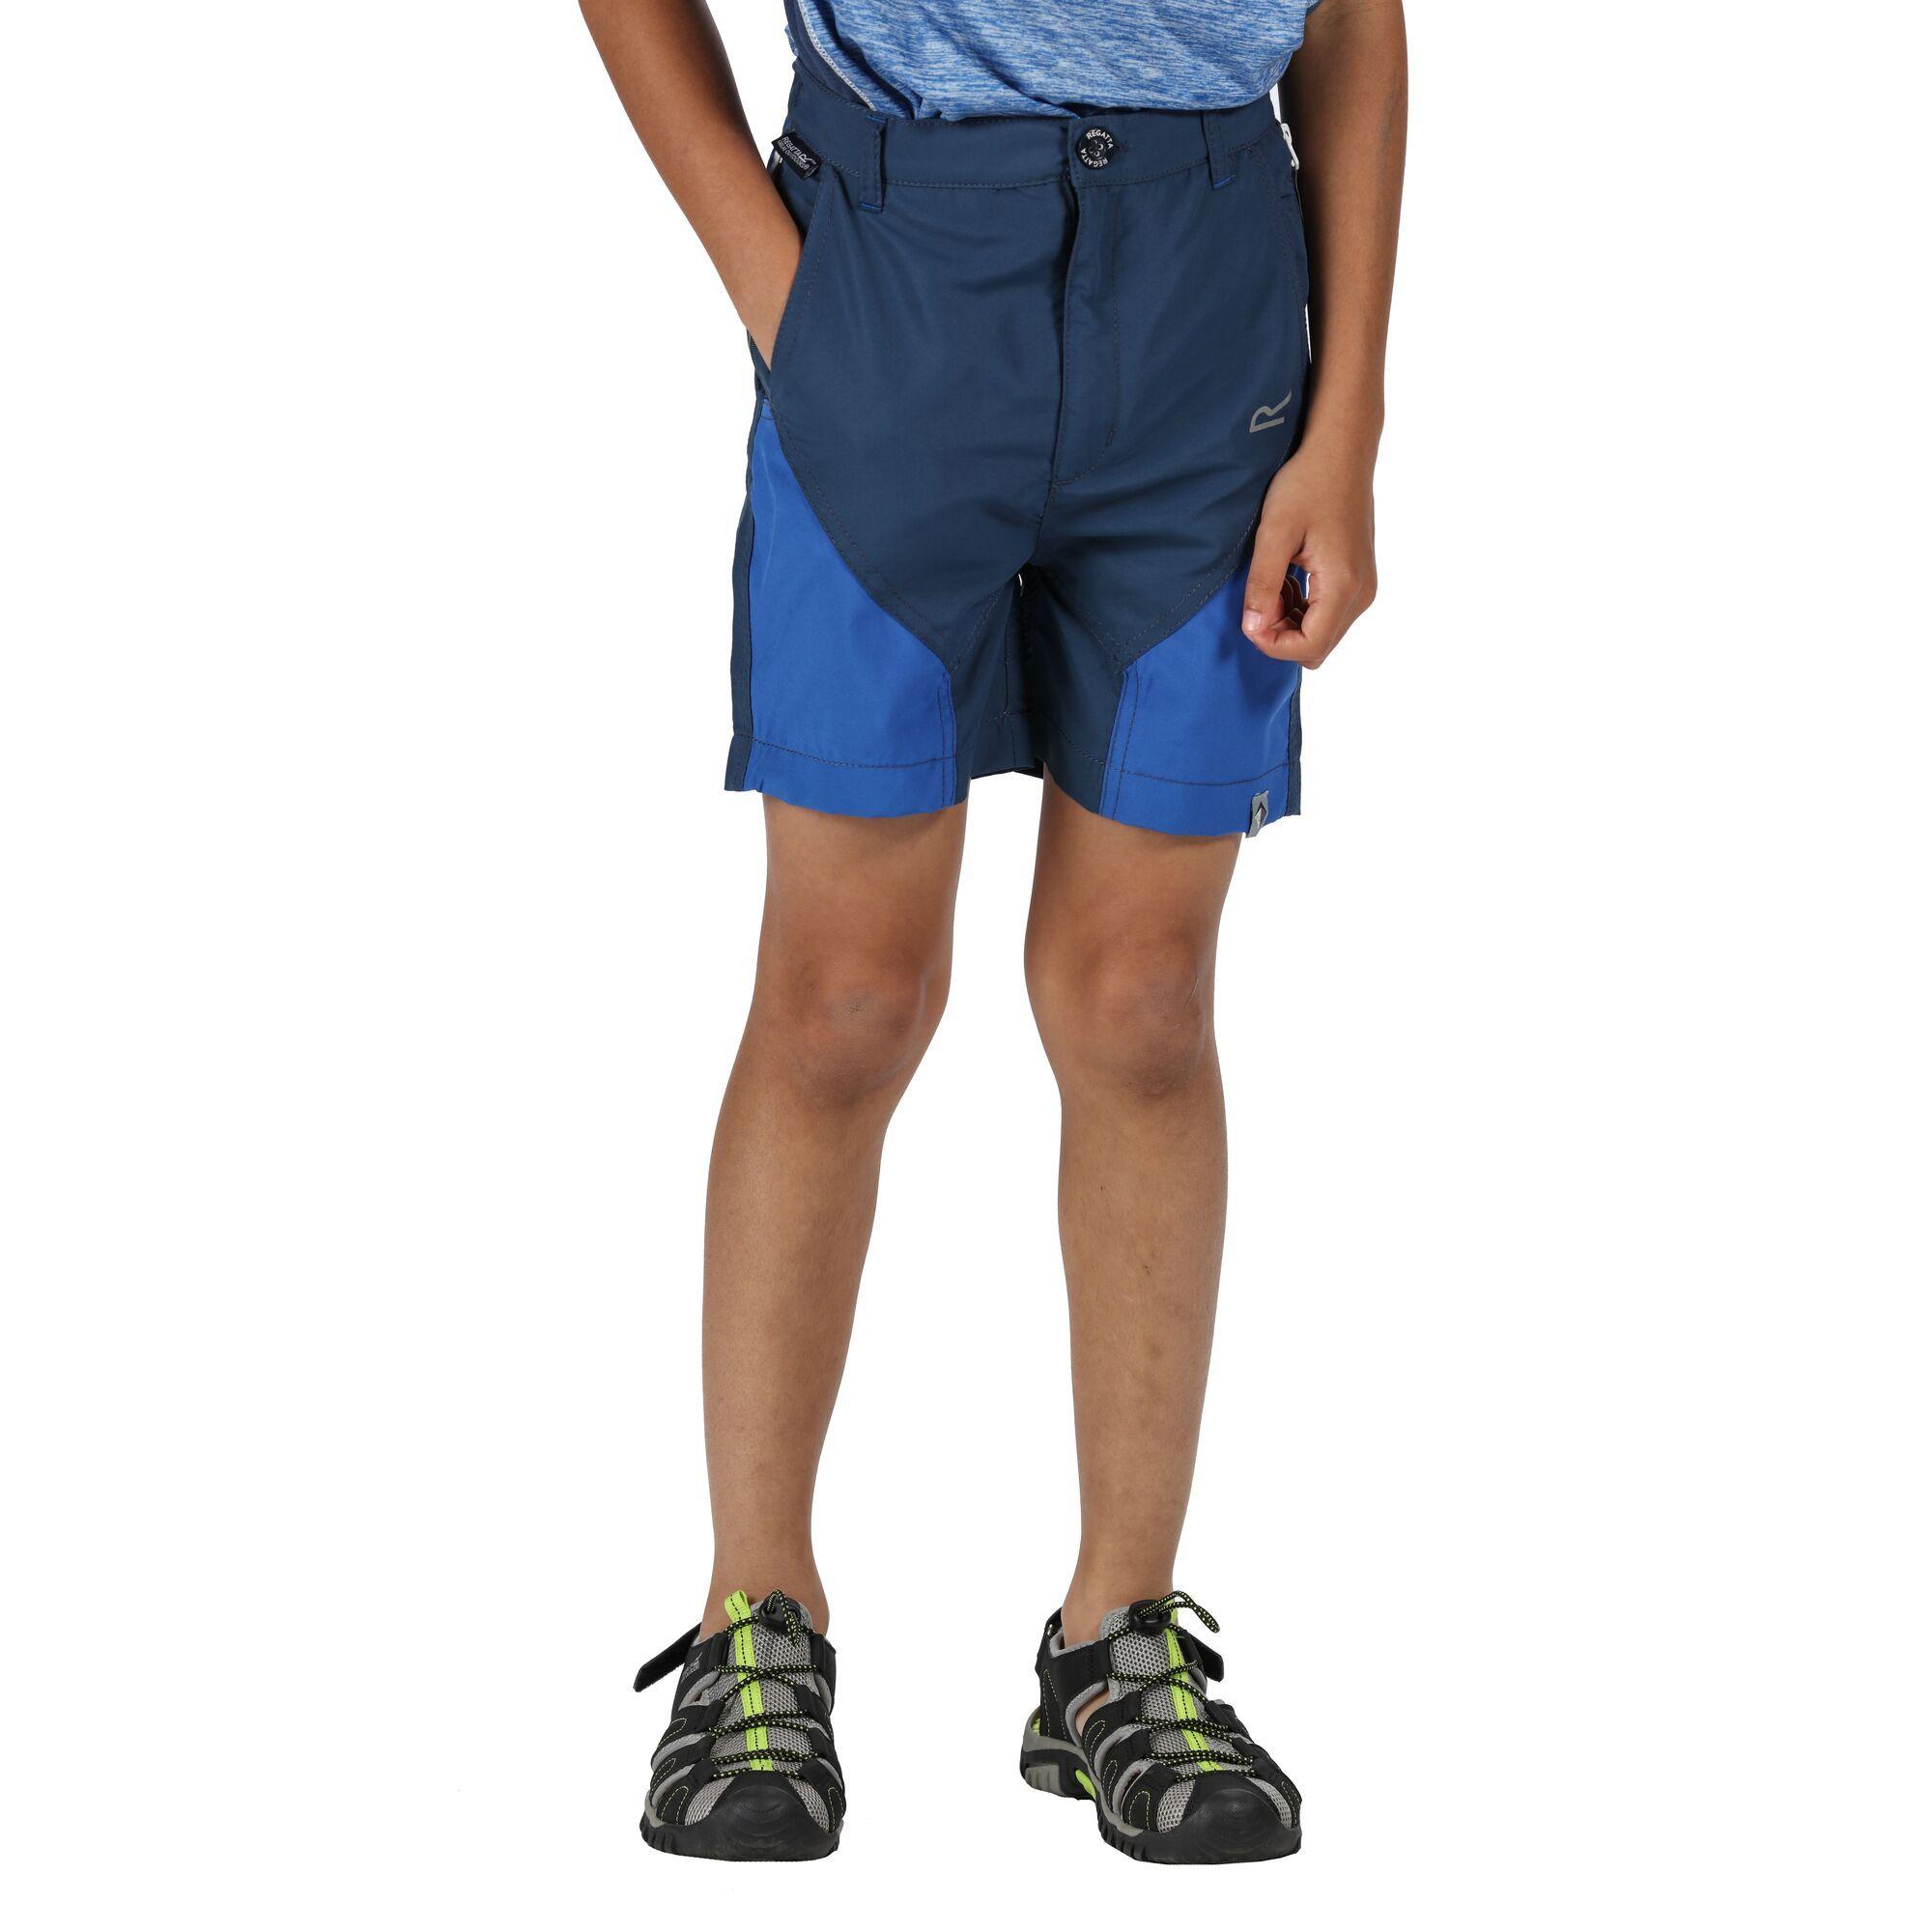 Regatta Childrens/Kids Sorcer Mountain Shorts